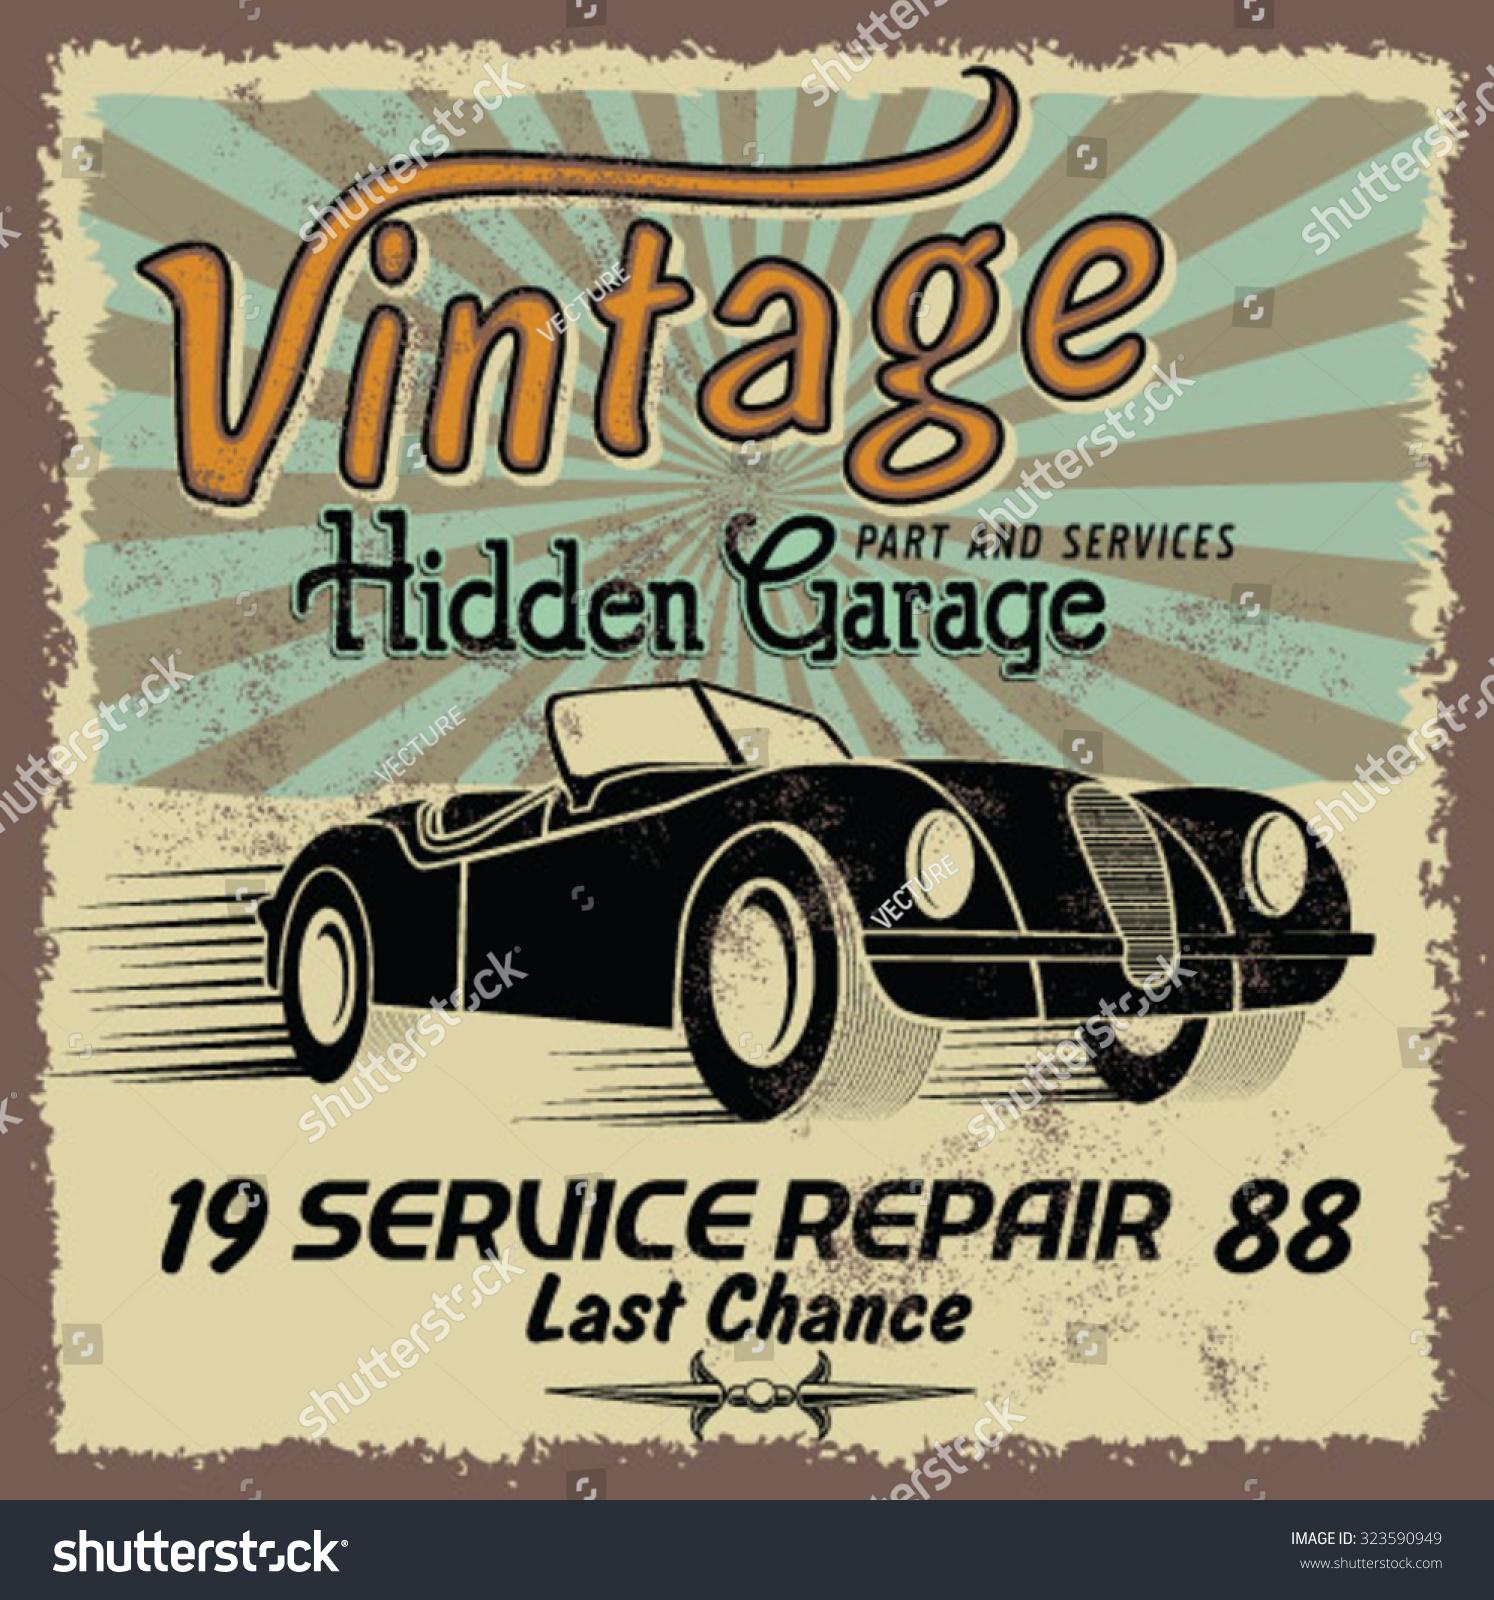 Vintage Race Car Printingvector Old School Stock Photo (Photo ...